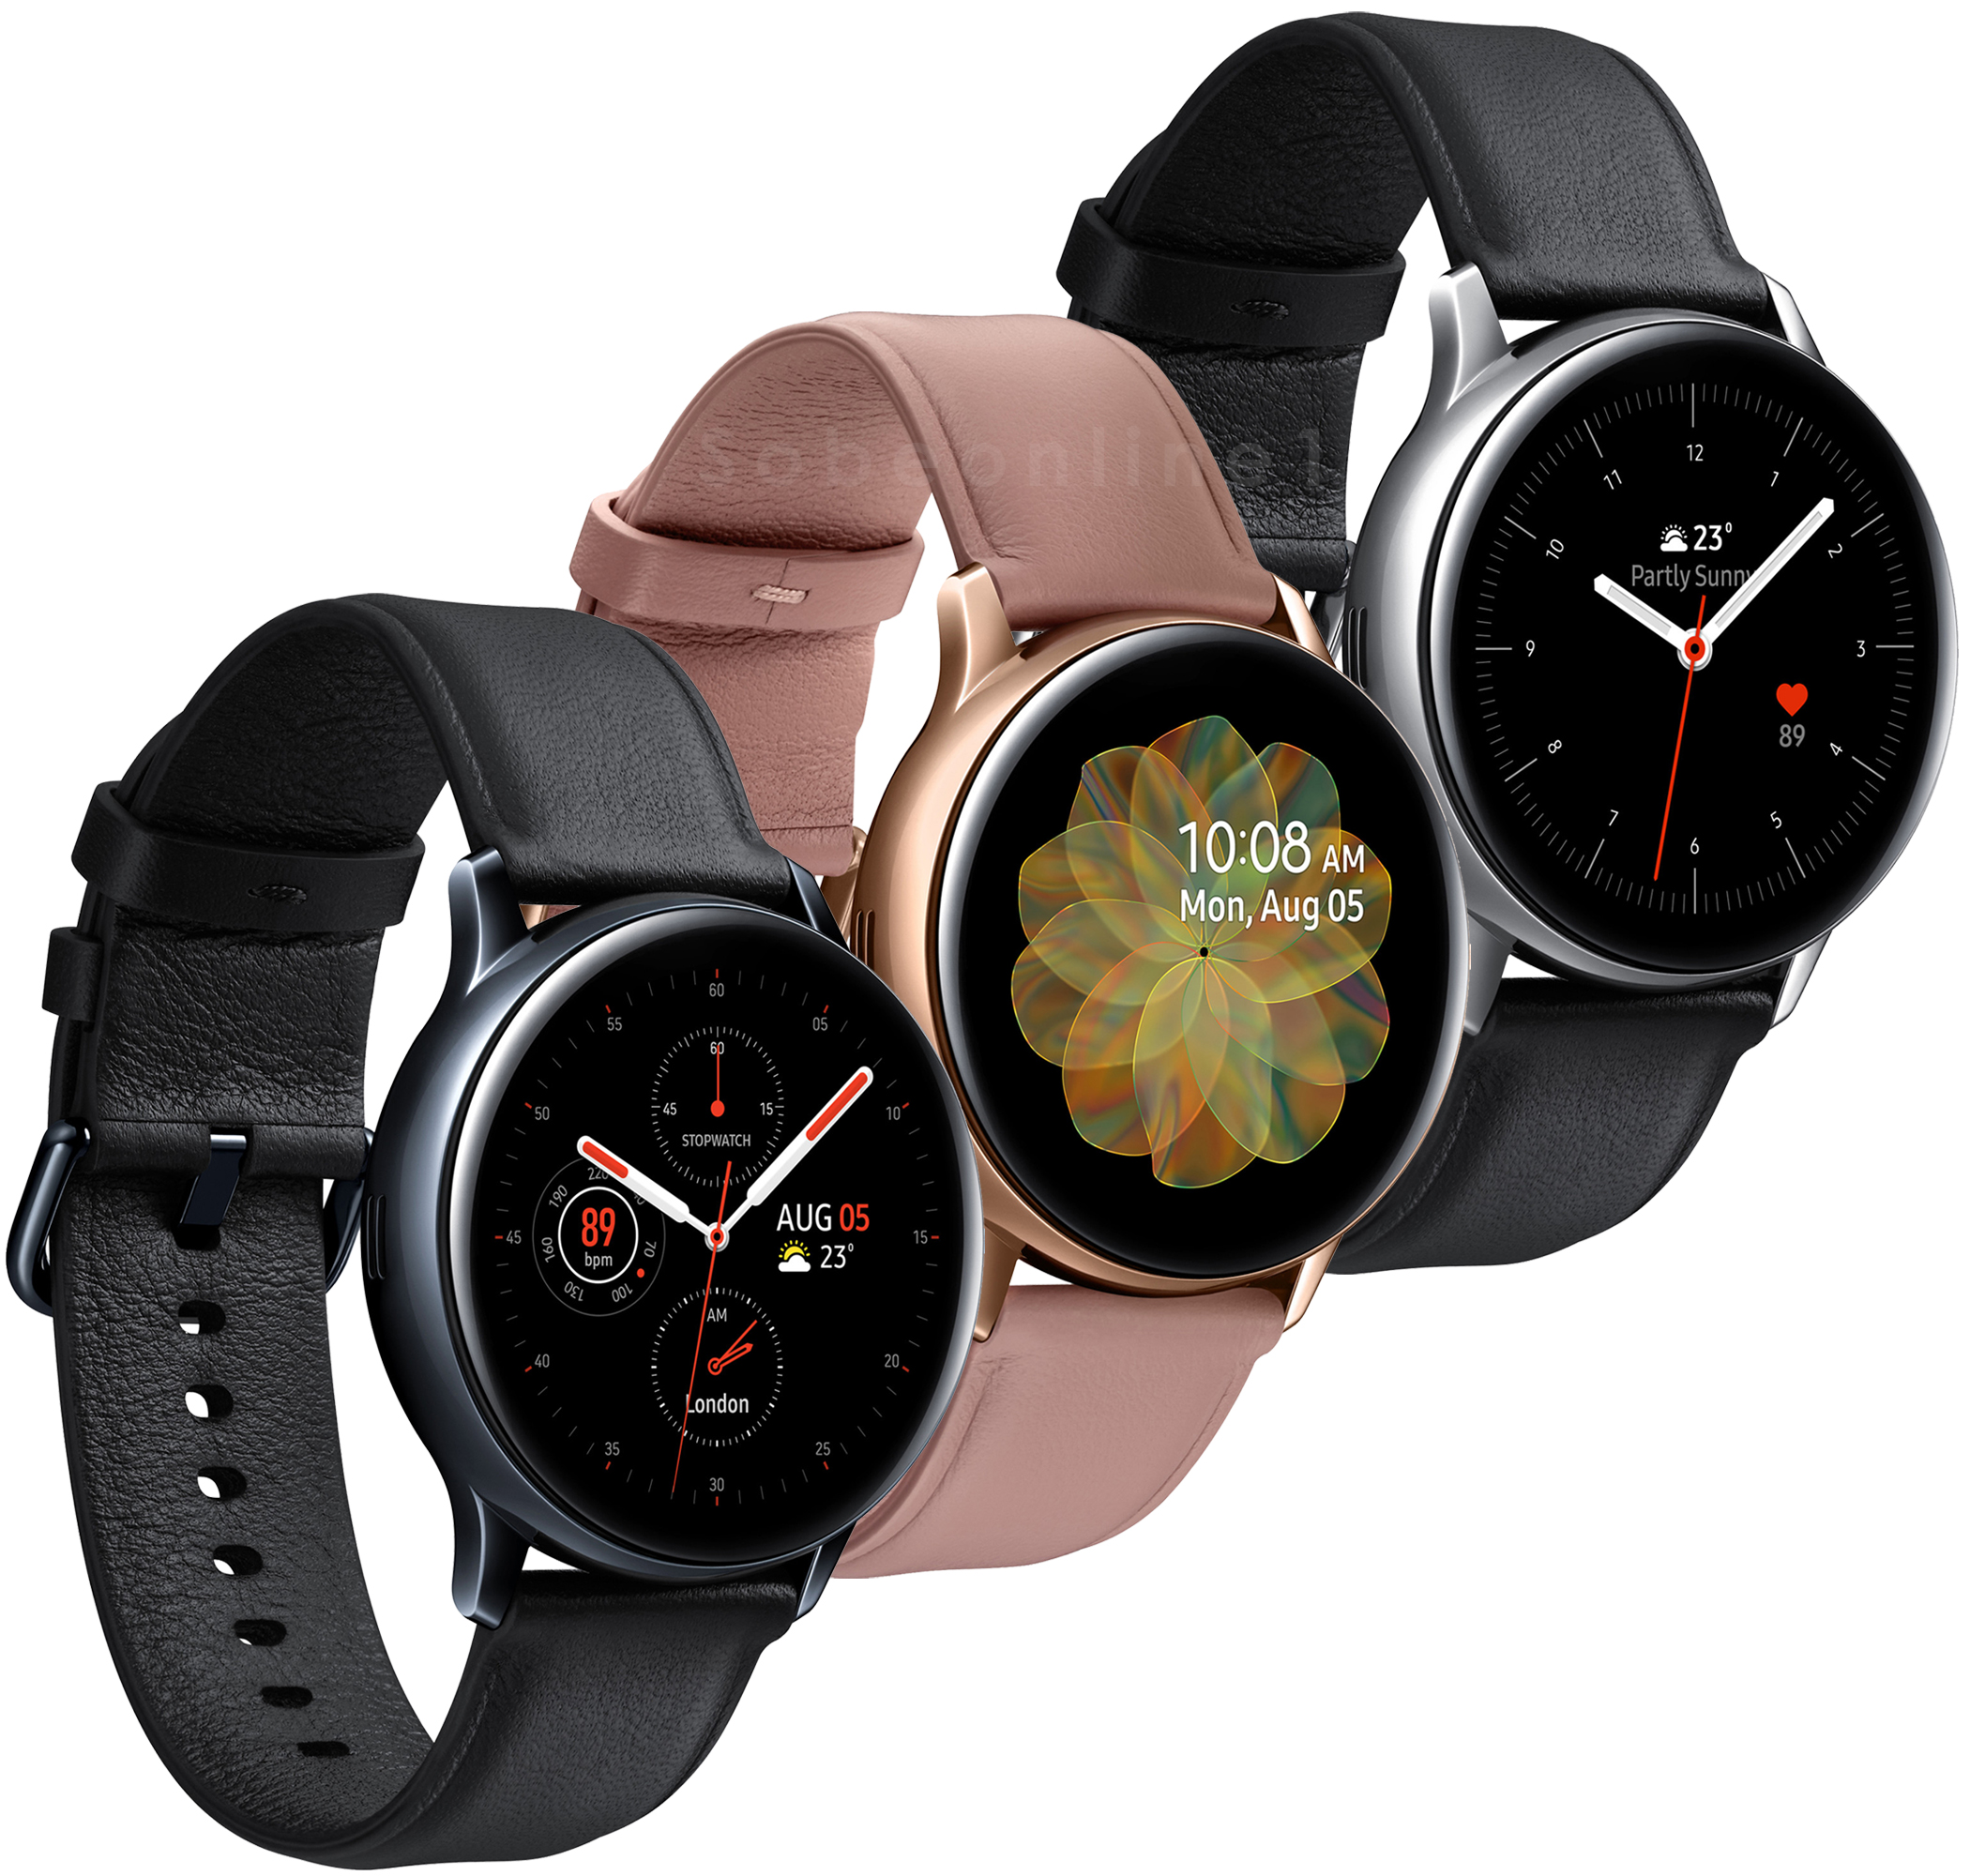 samsung galaxy watch active 2 price in bd